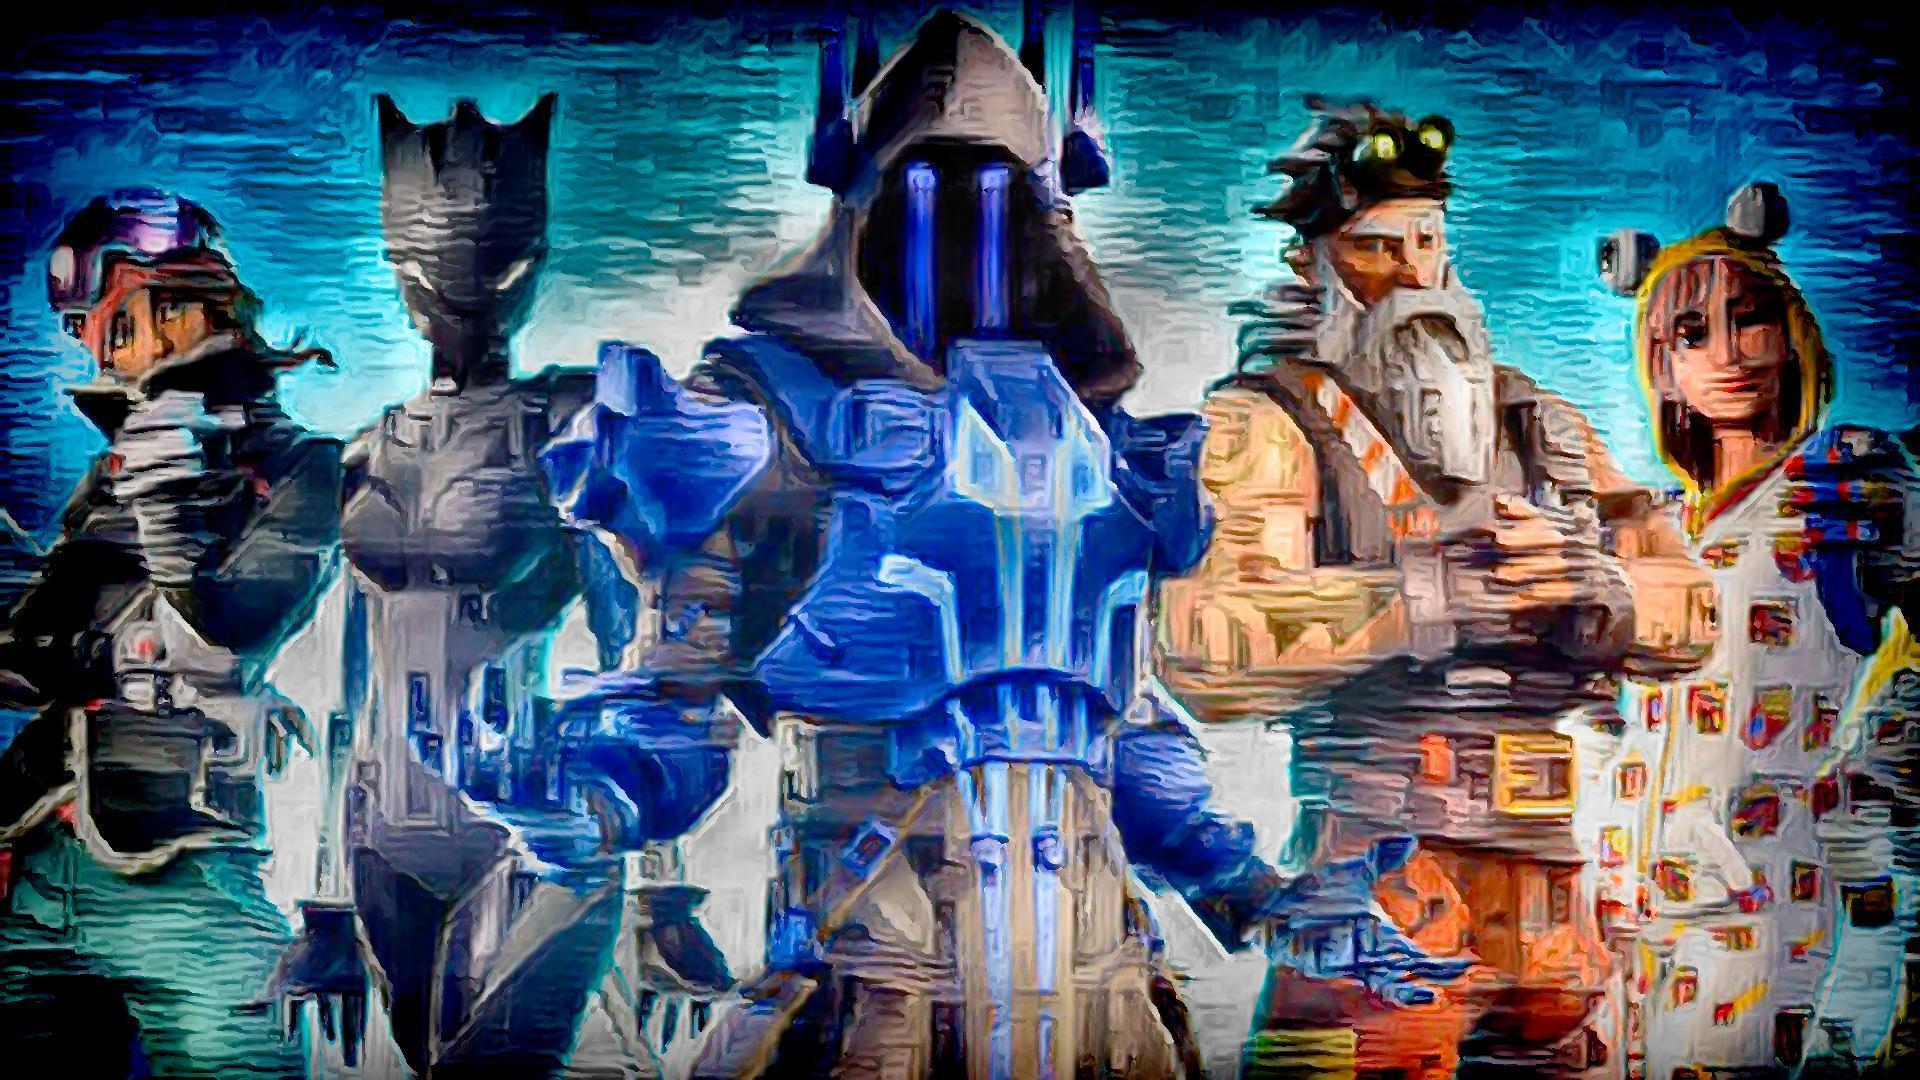 Fortnite Wallpapers Hd Desktop And Mobile Fortnite - Fortnite Battle Pass Season 7 , HD Wallpaper & Backgrounds